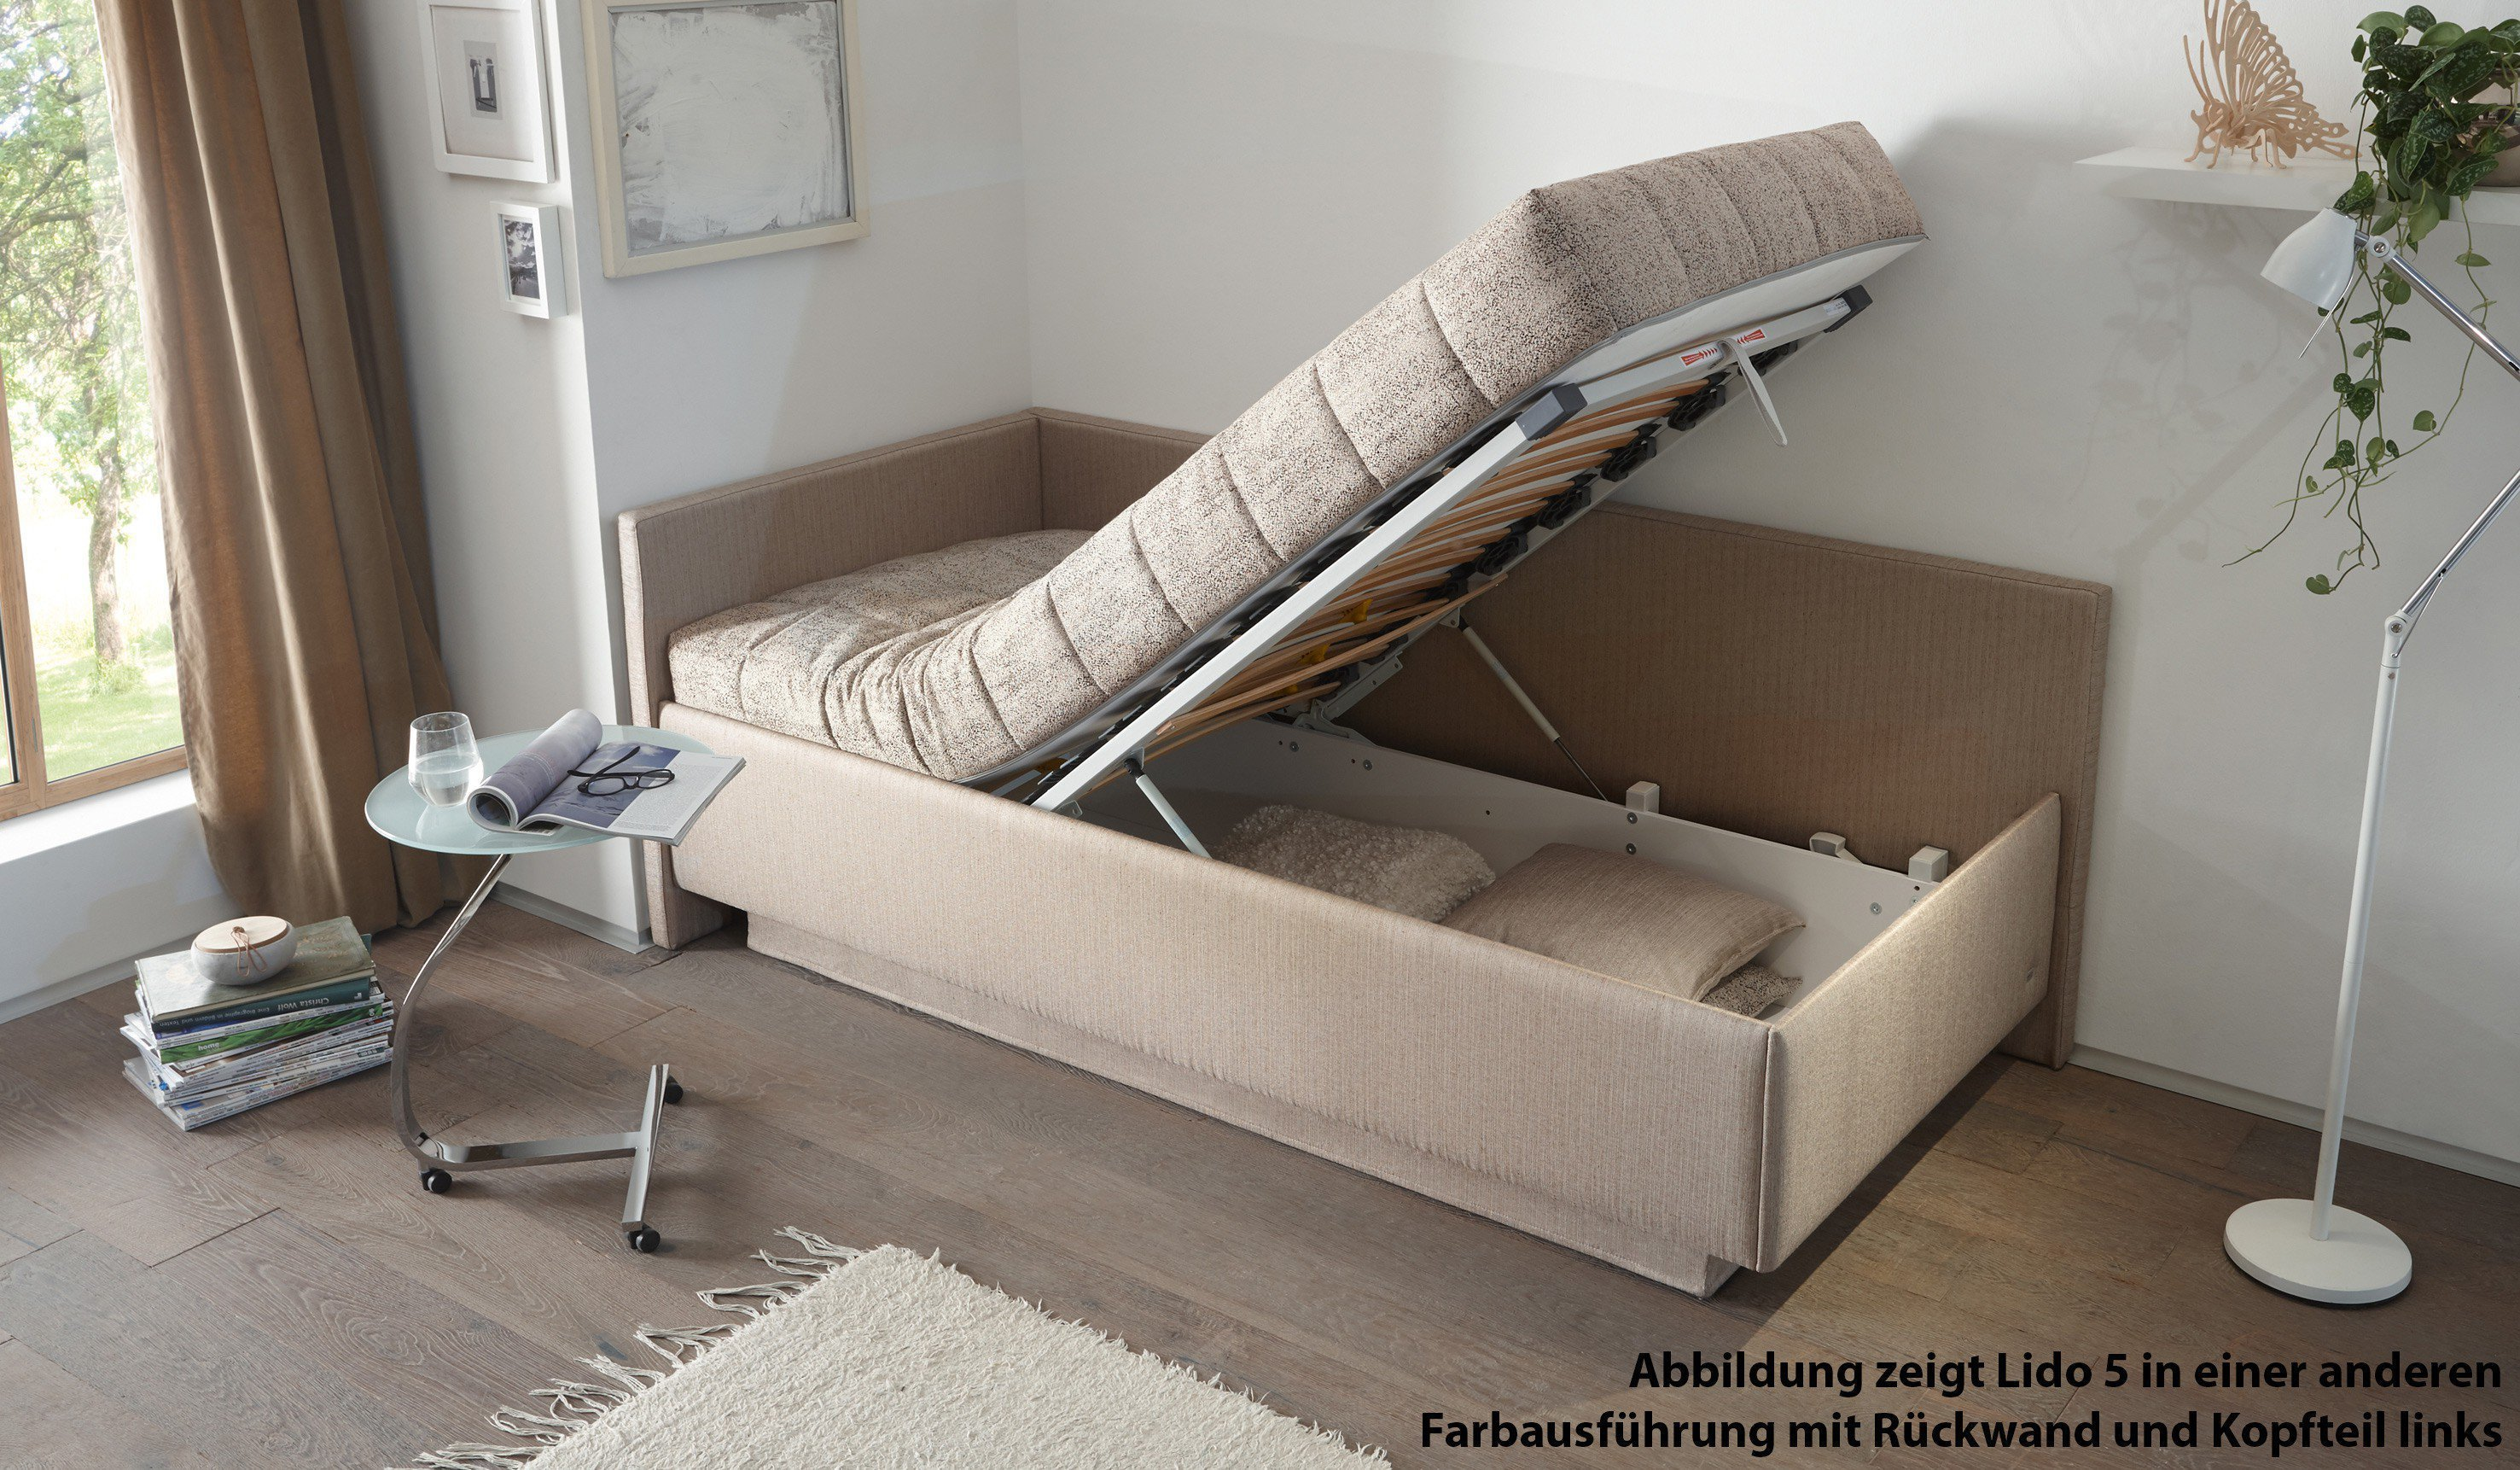 ruf polsterbett modell lido in dunkelblau mit bettkasten. Black Bedroom Furniture Sets. Home Design Ideas